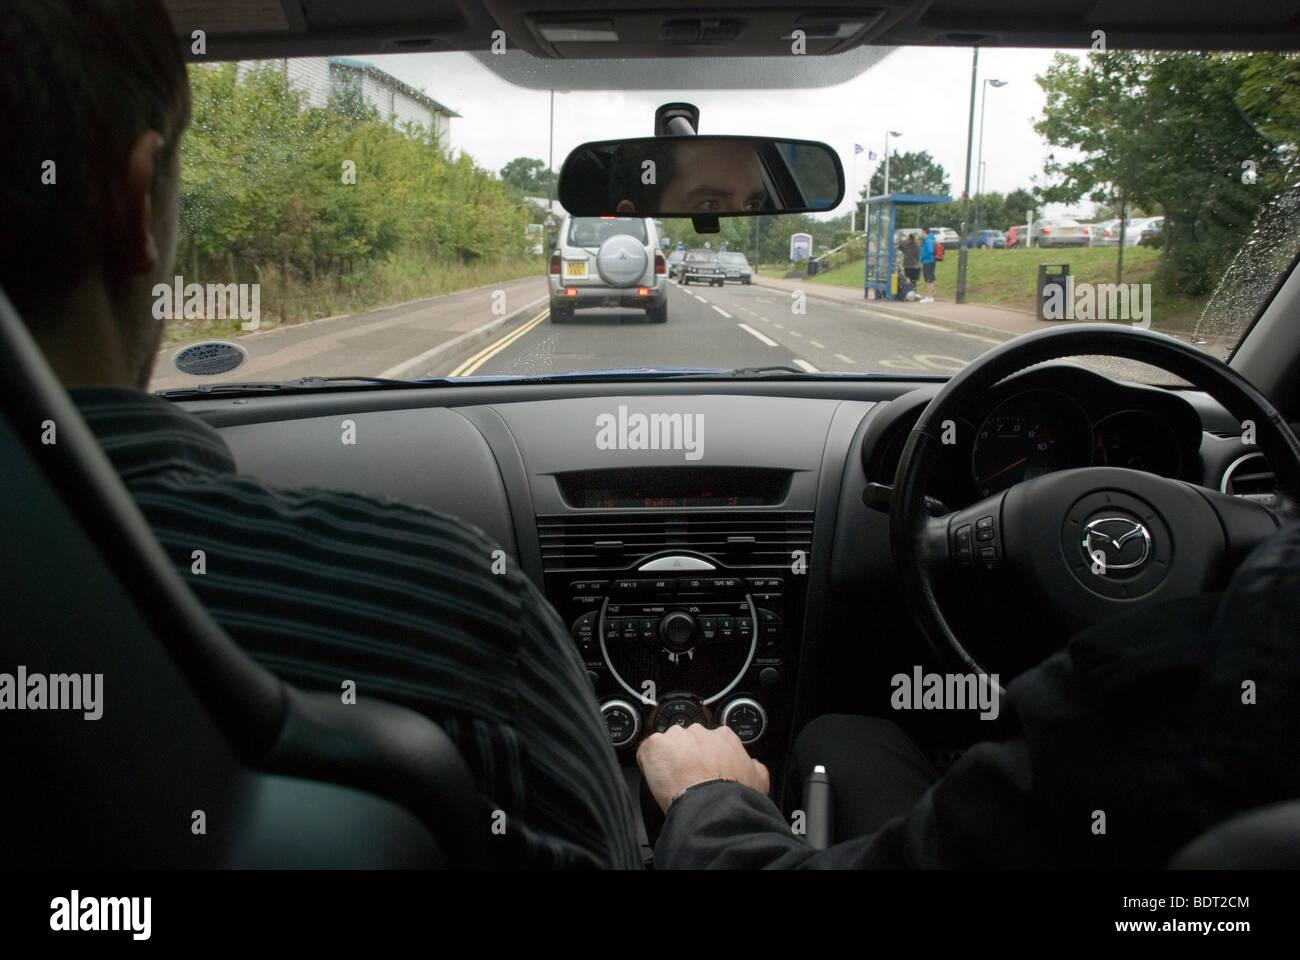 Interior Of Mazda Rx 8 Stockfotos & Interior Of Mazda Rx 8 Bilder ...